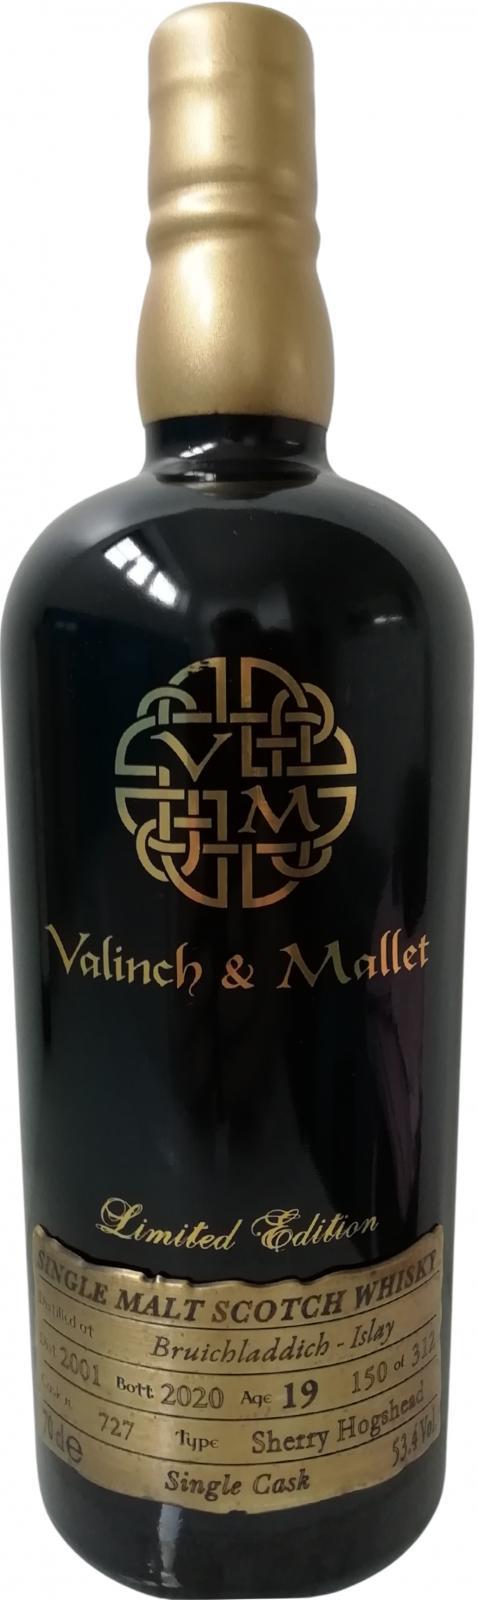 Bruichladdich 2001 V&M